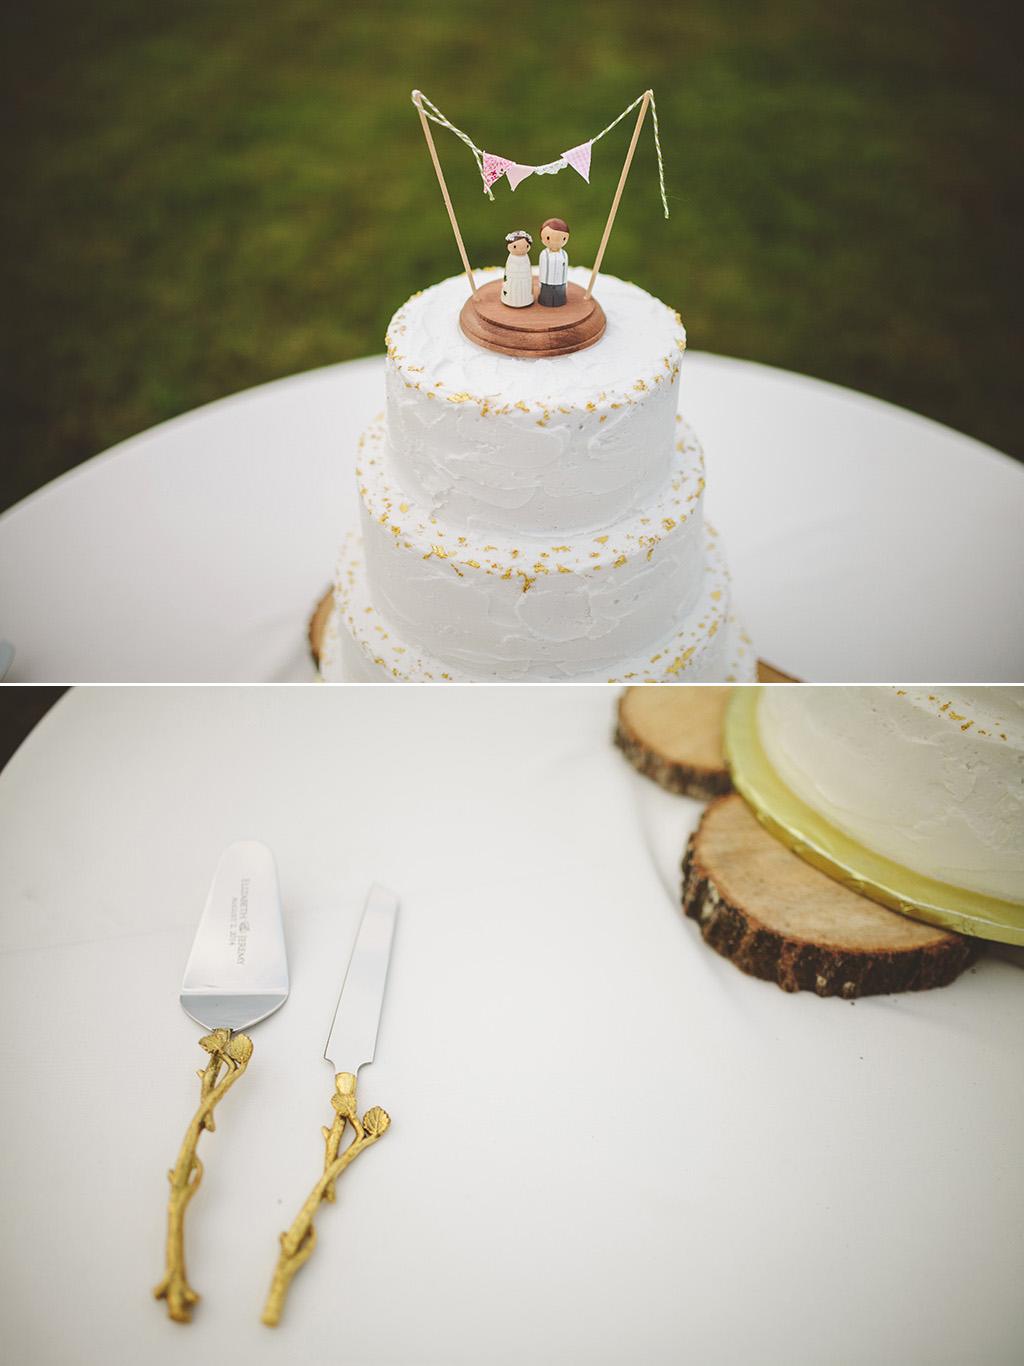 DIY wedding cake and topper